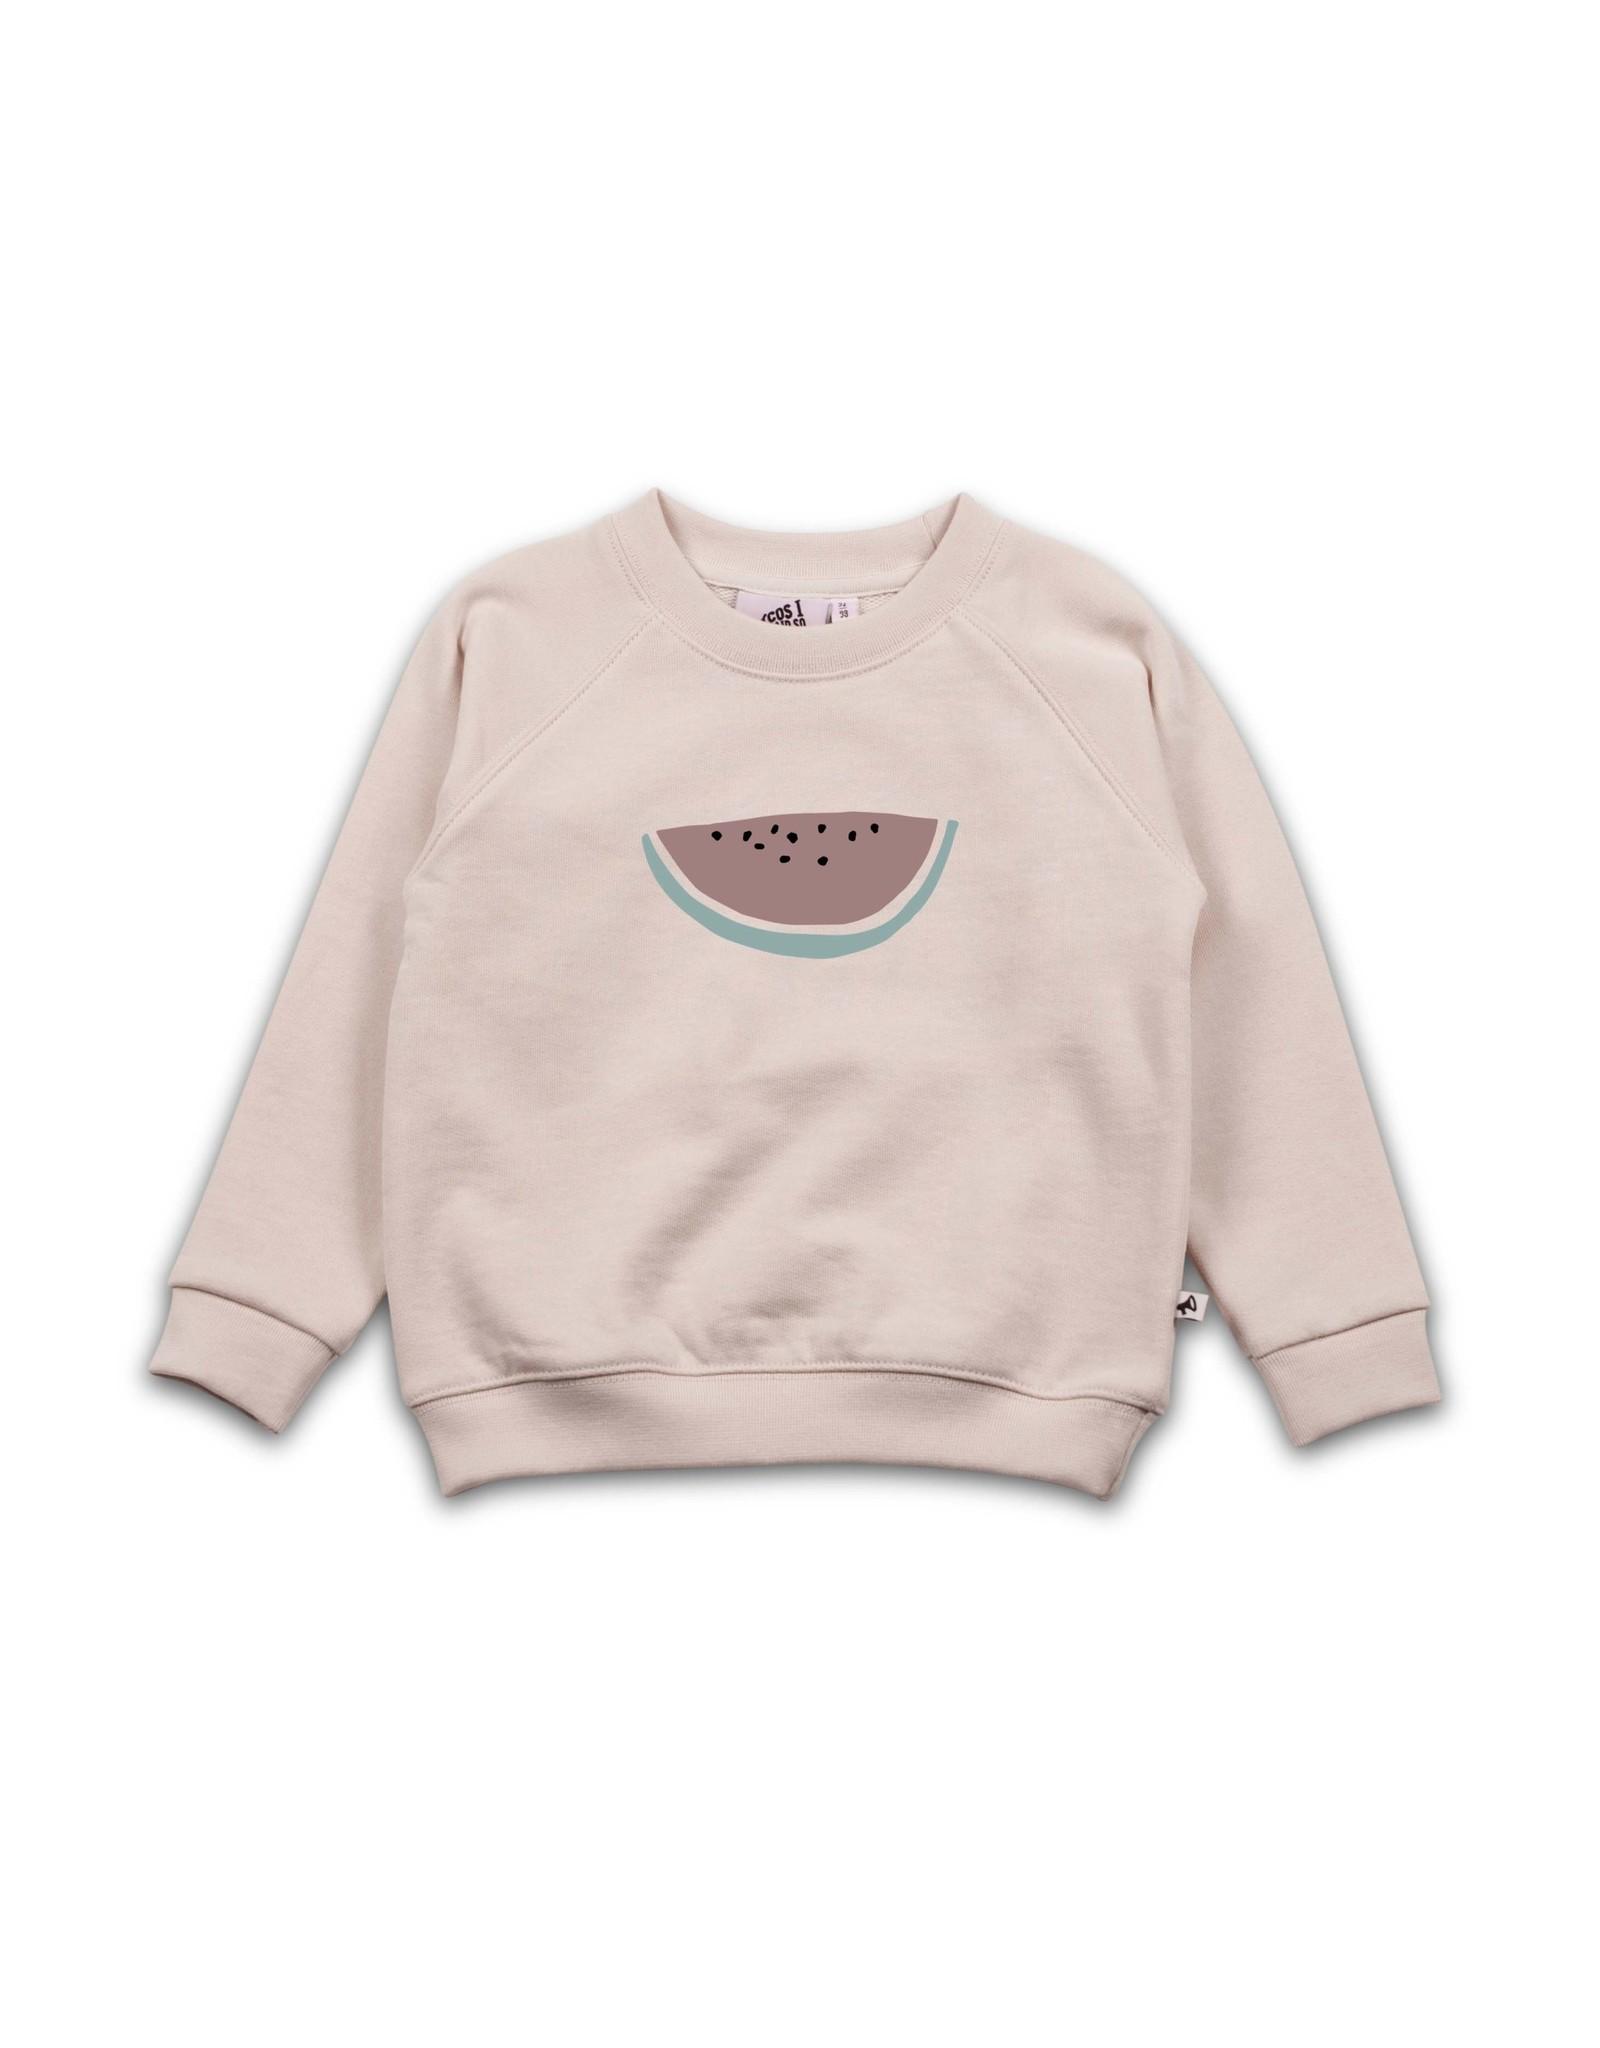 Cos I Said So sweater watermelon